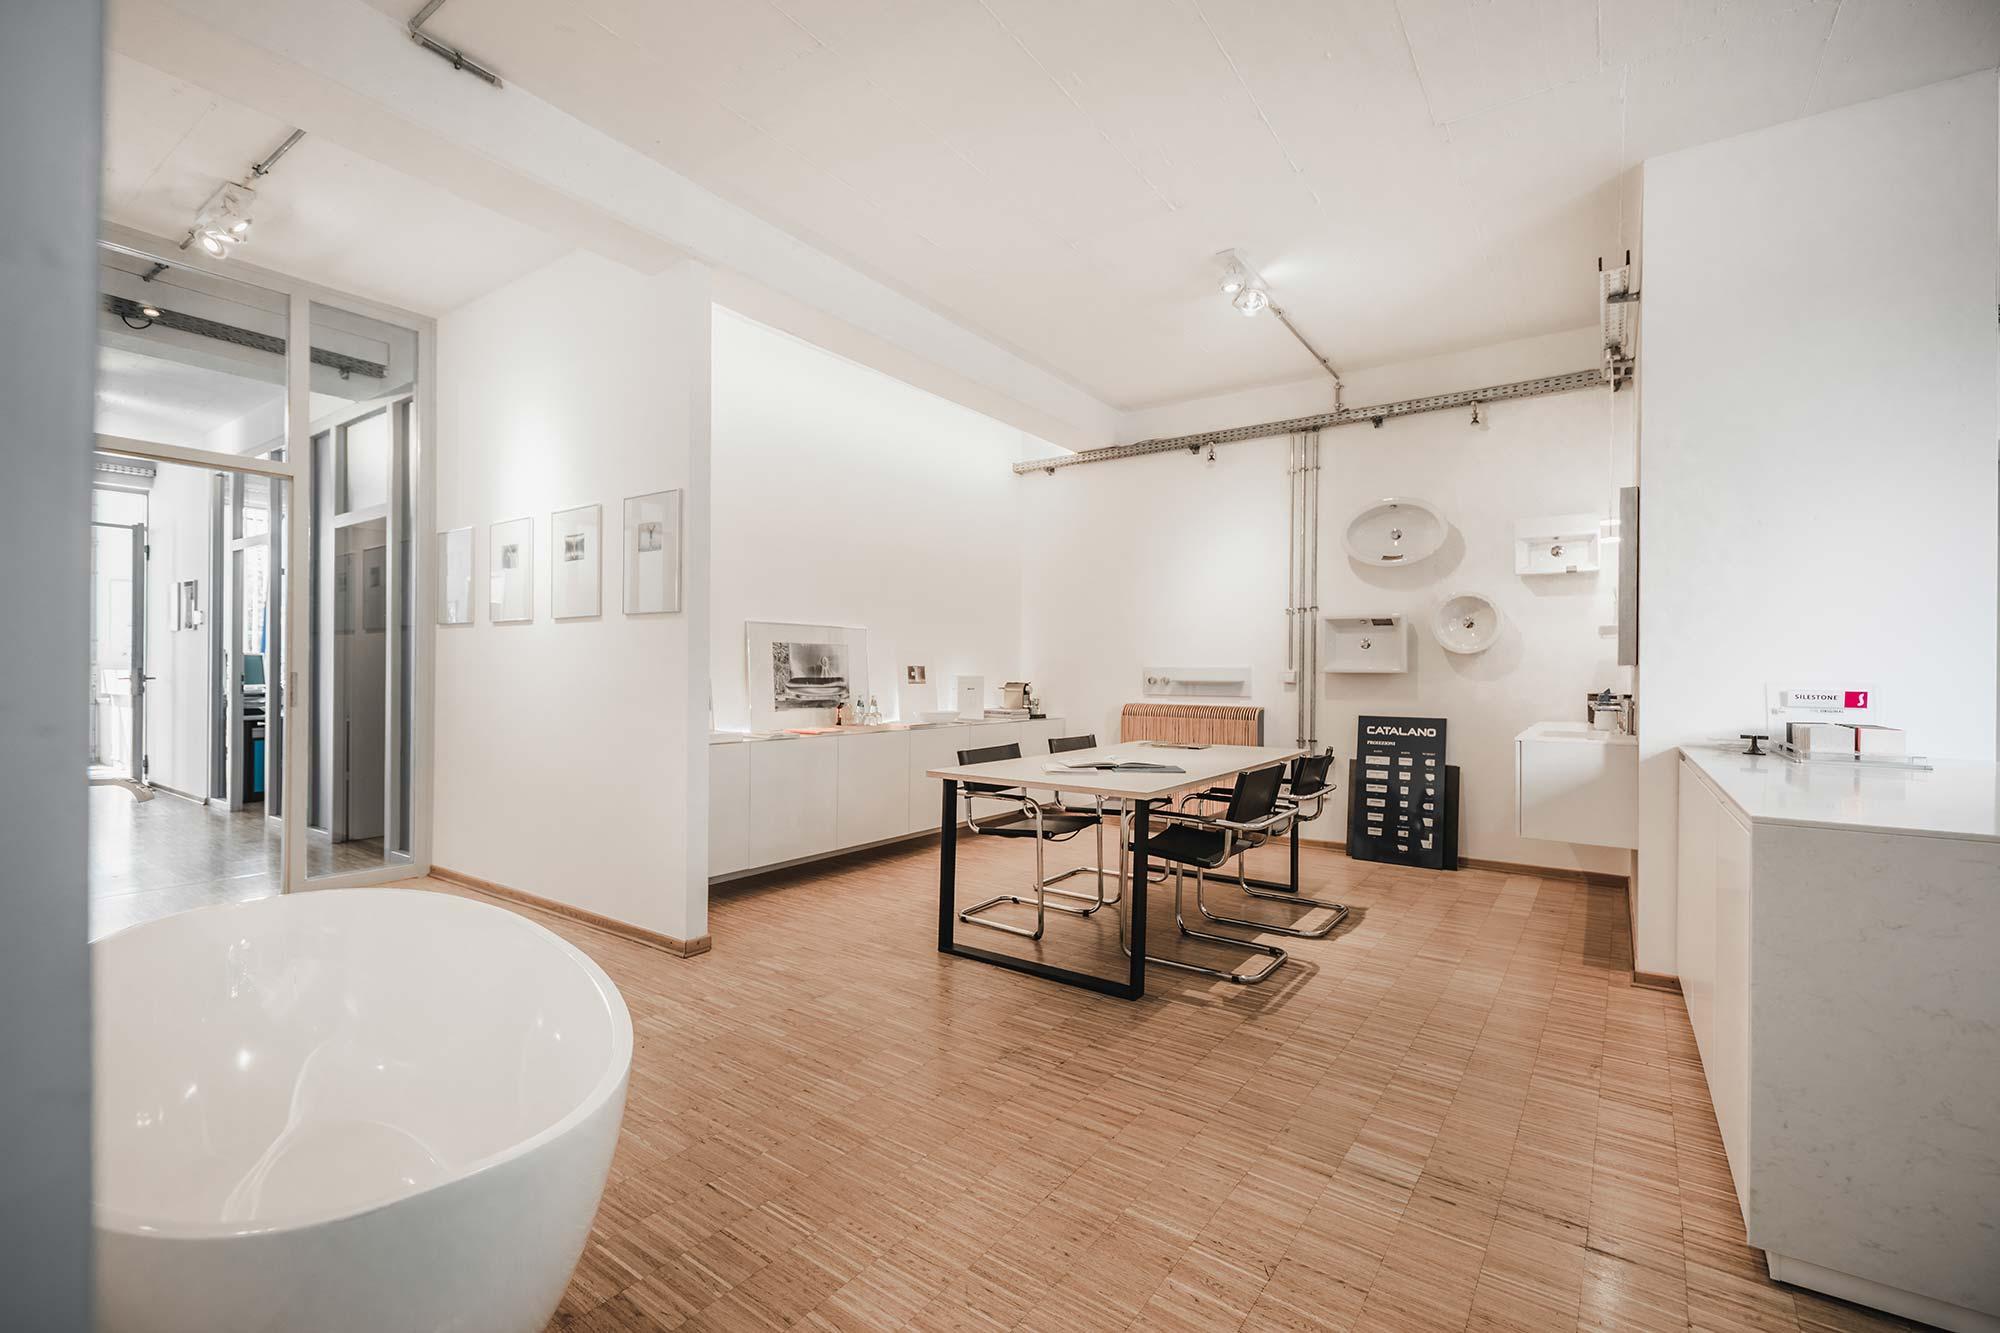 Badezimmer Sanitär Ausstellung